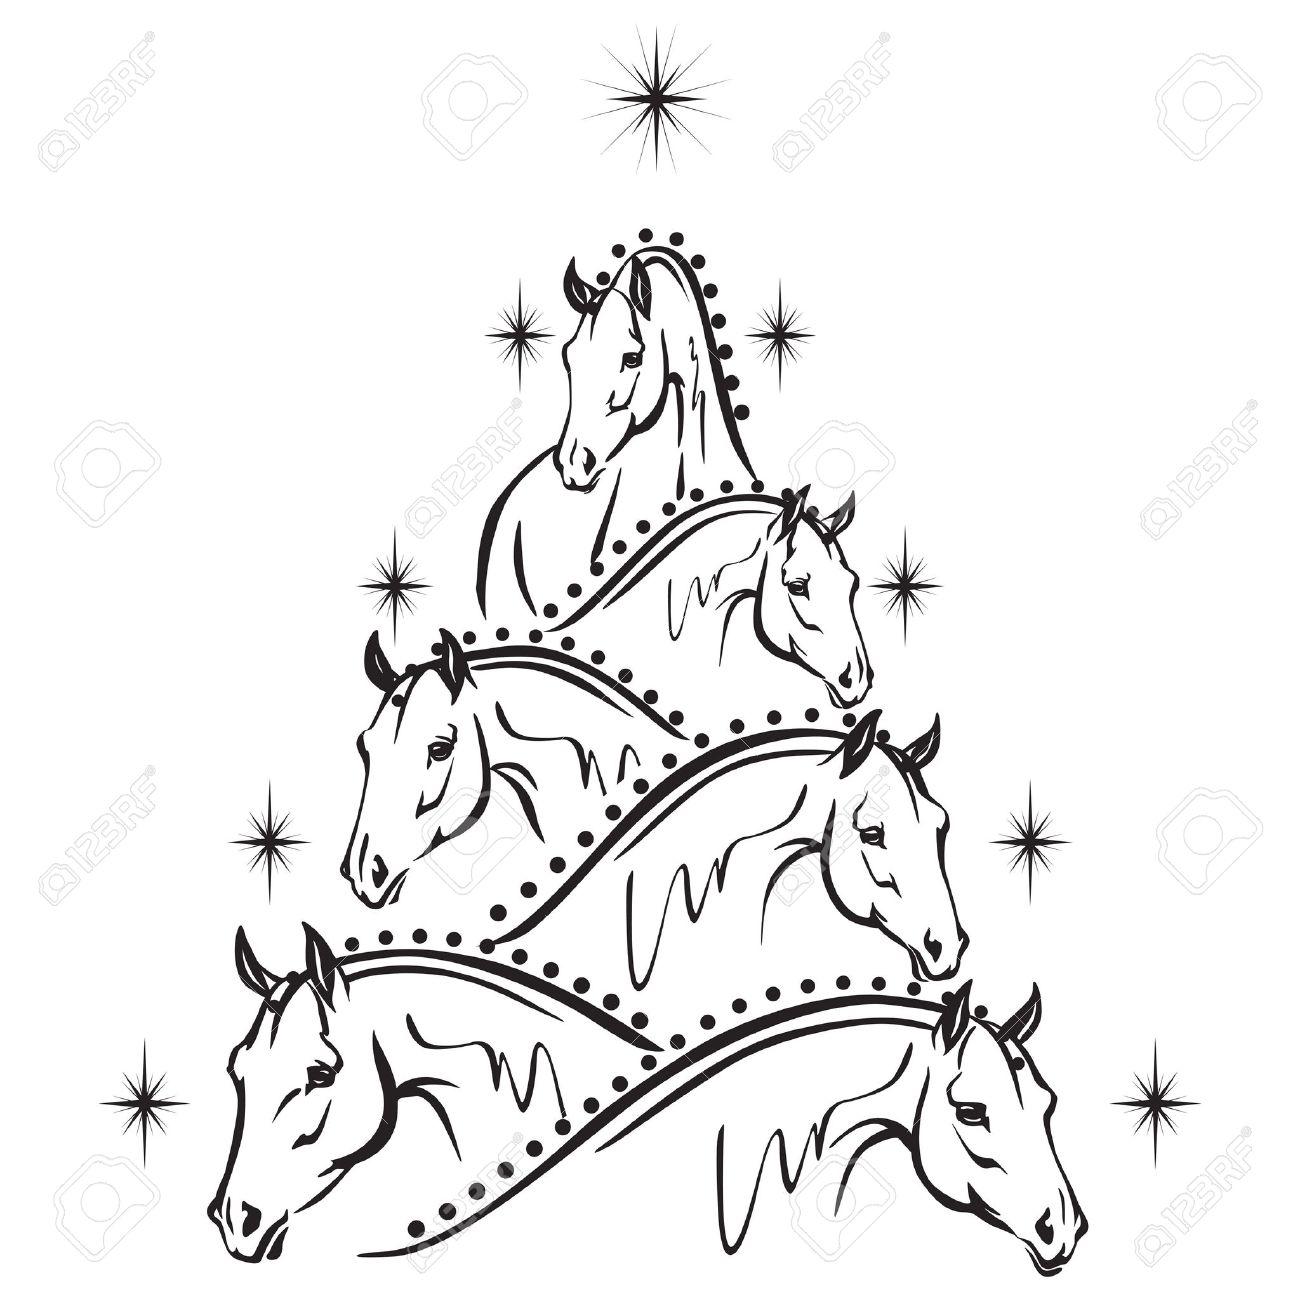 Horse Lovers Christmas Tree - Sport Horses Royalty Free Cliparts ...